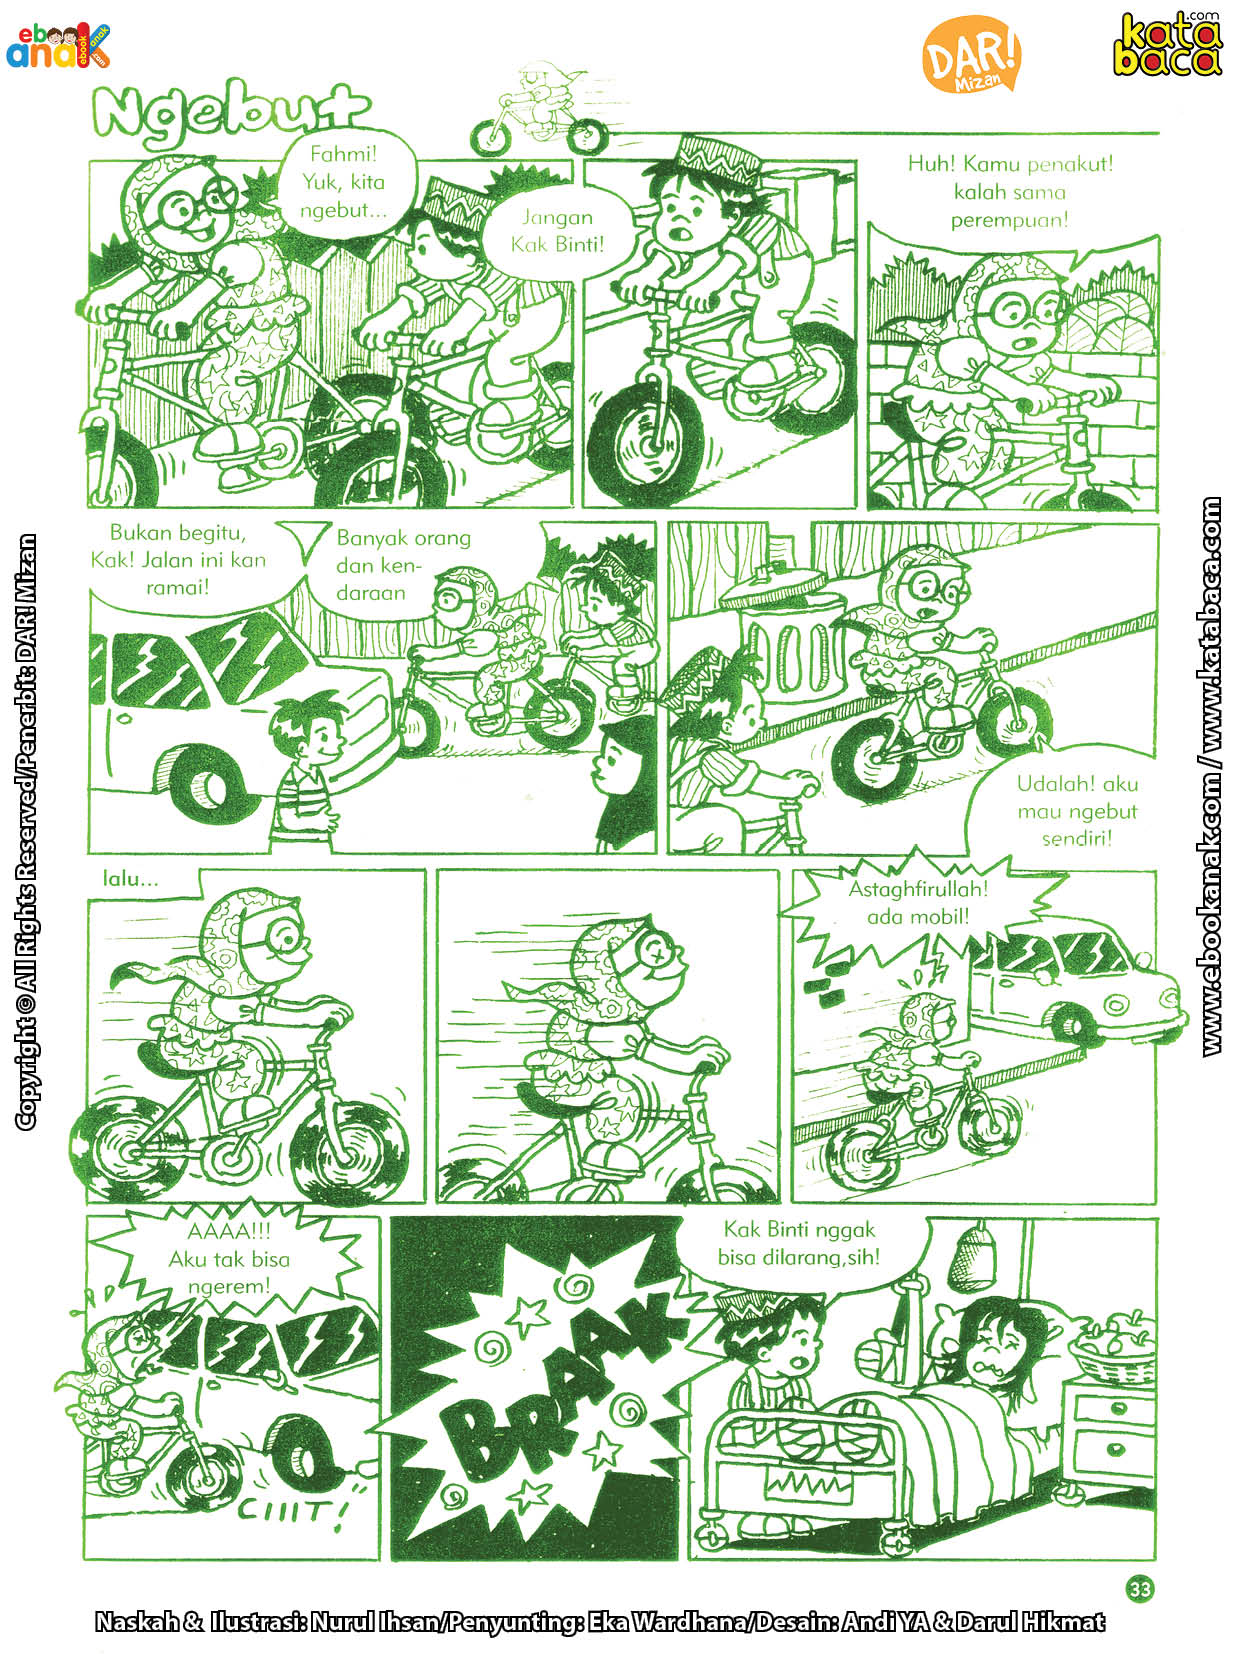 baca buku online komik ibadah centil centil cerdas, Binti senang main balapan sepeda di jalan